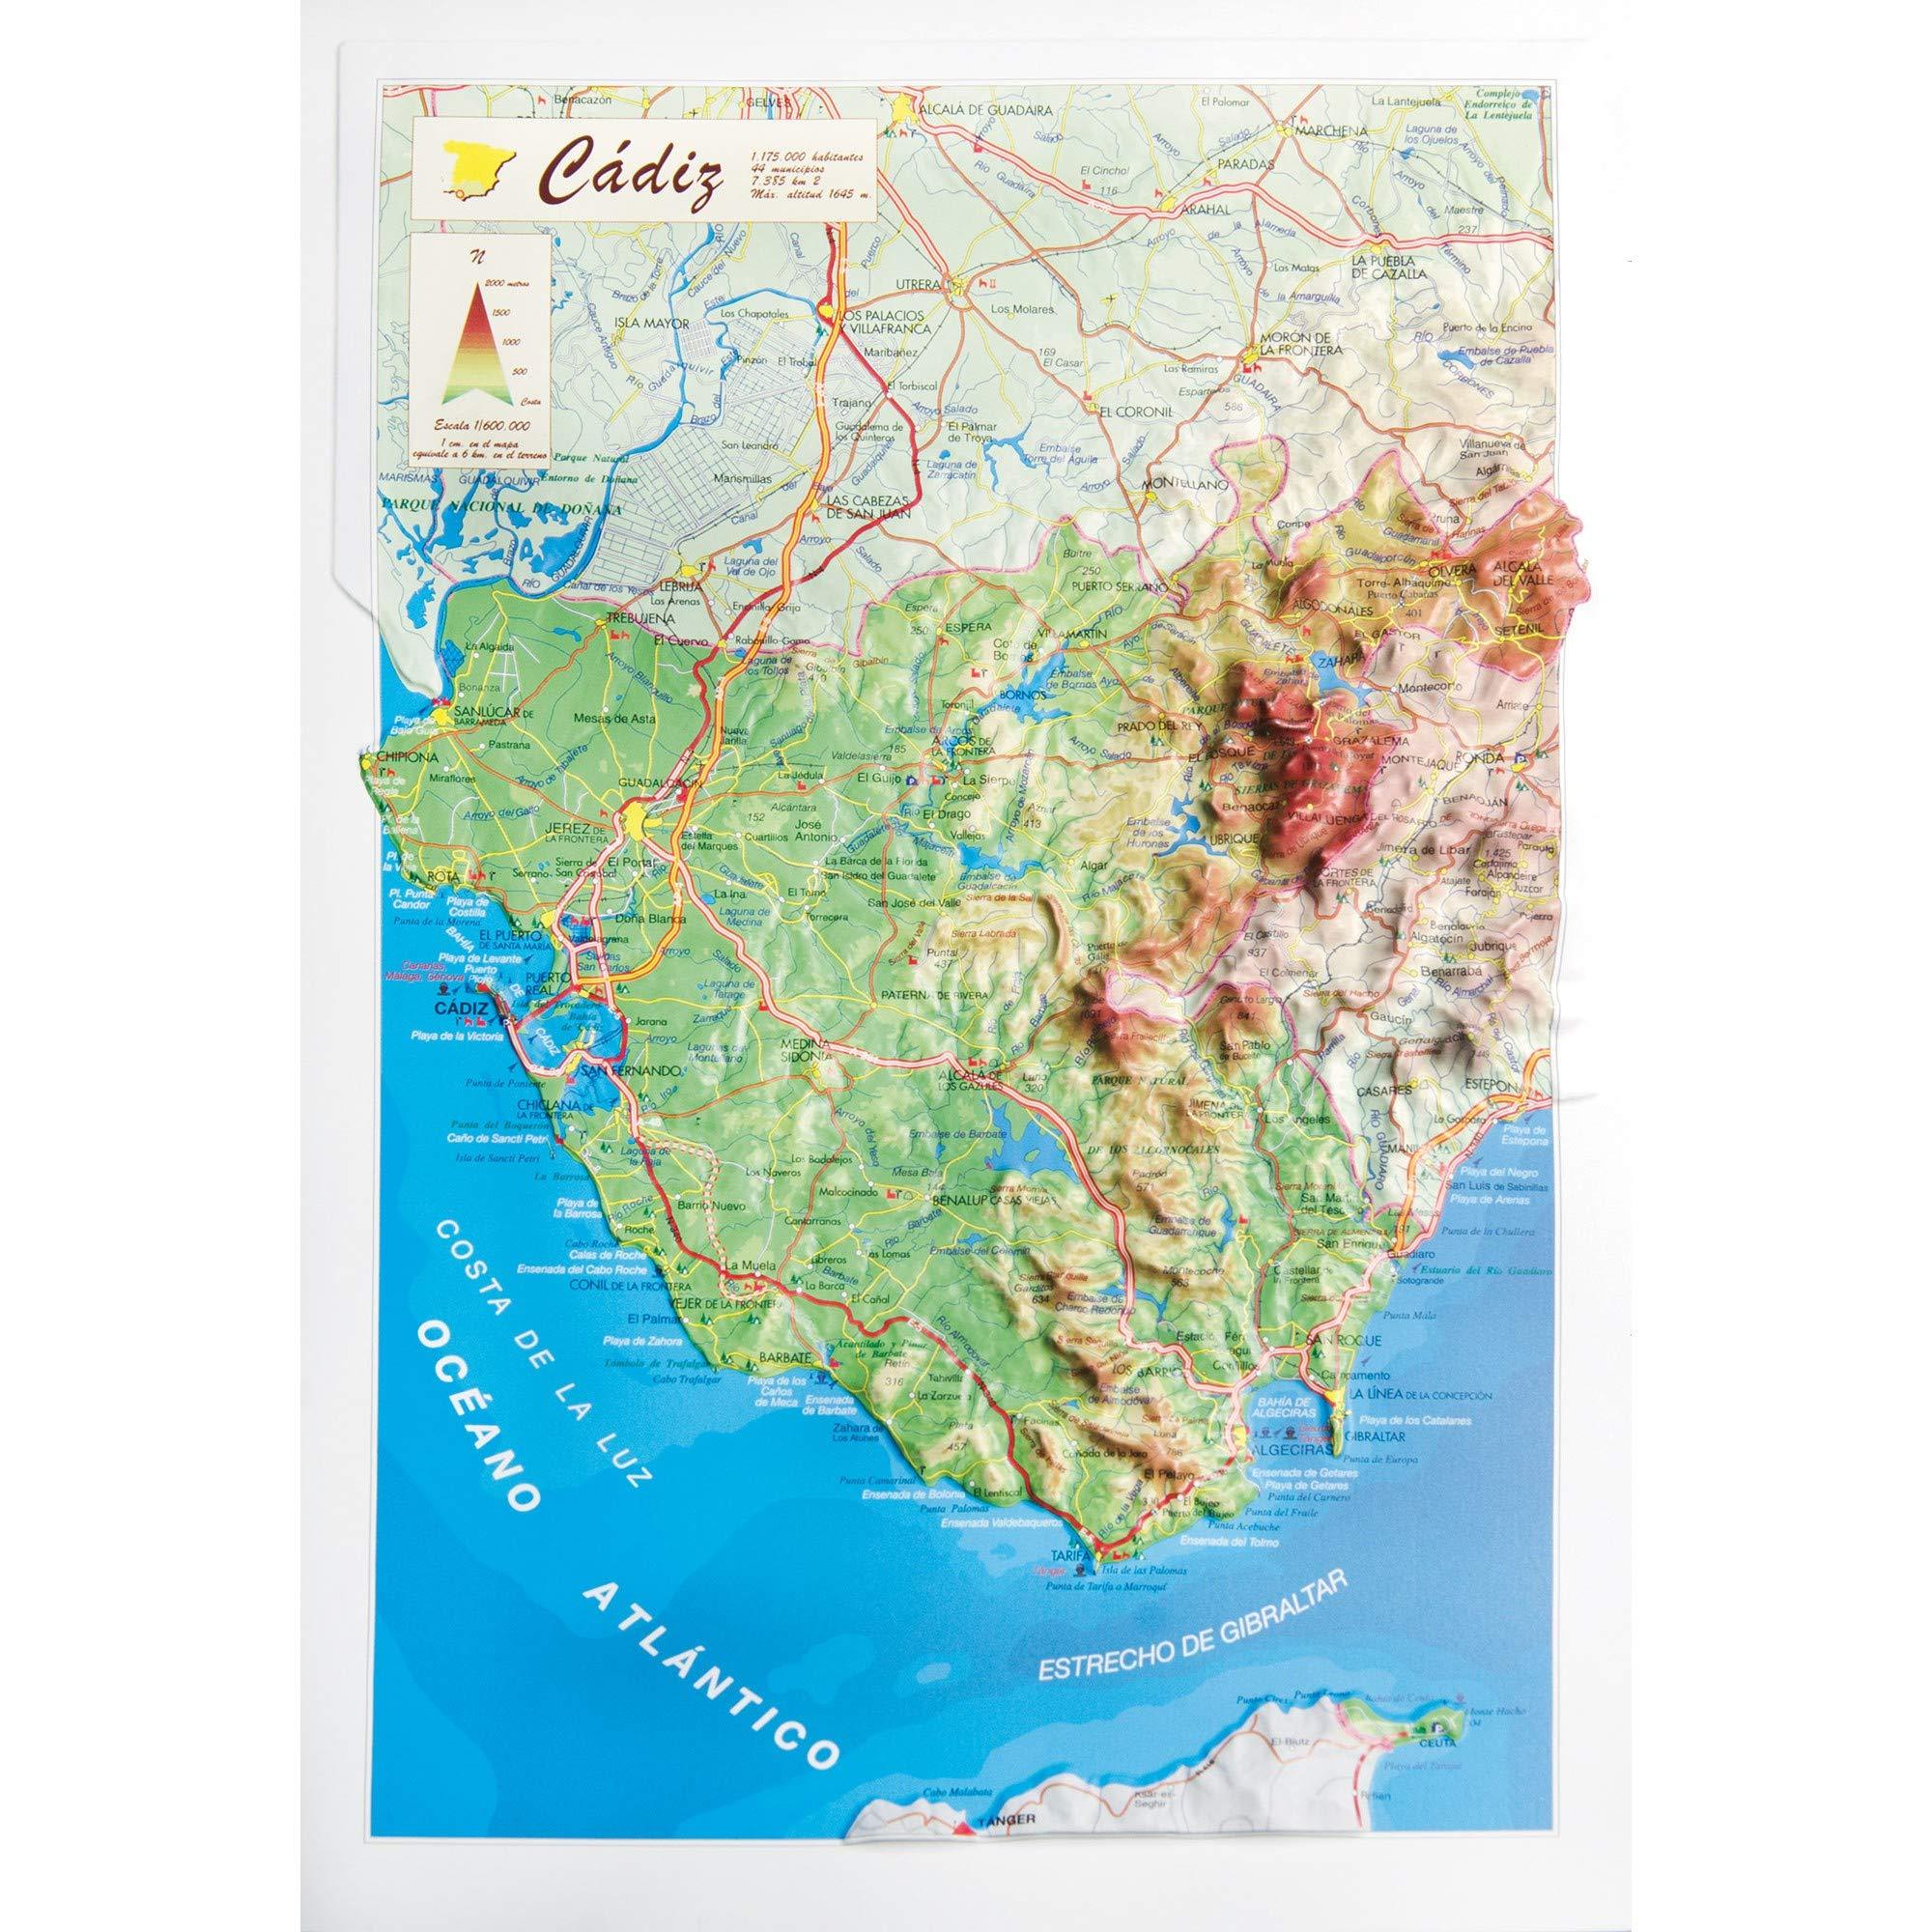 Mapa en relieve de Cádiz: Escala 1:600.000: Amazon.es: All 3D Form, S.L.: Libros